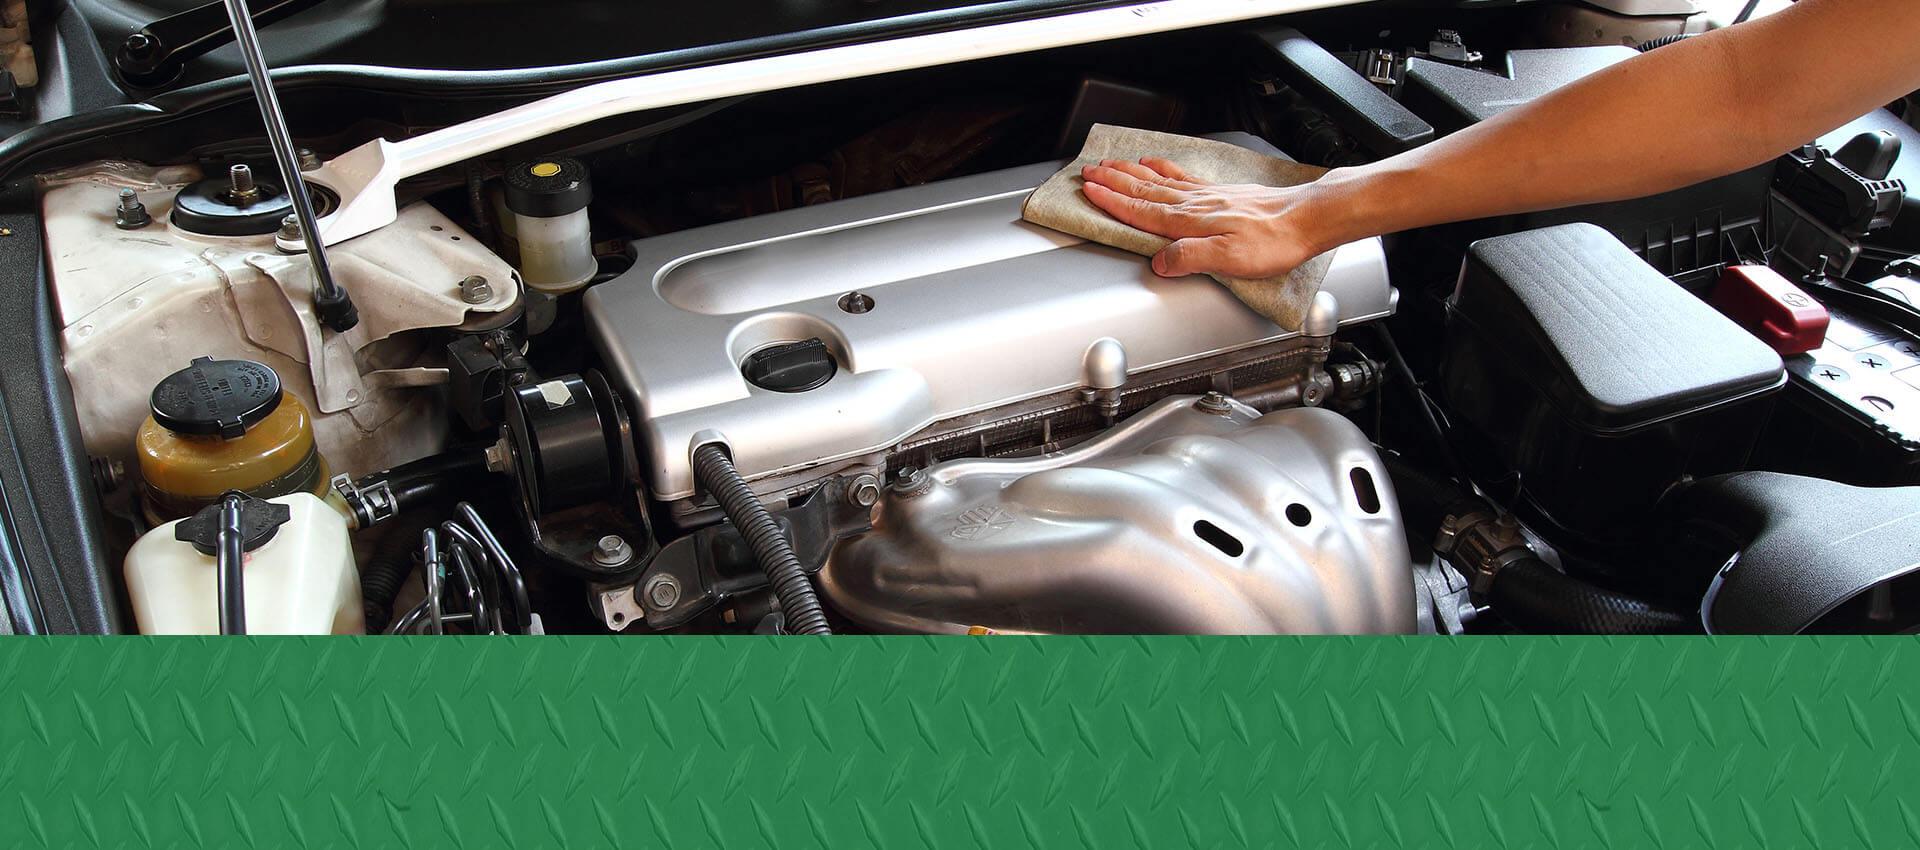 Oil Change Auto Repair